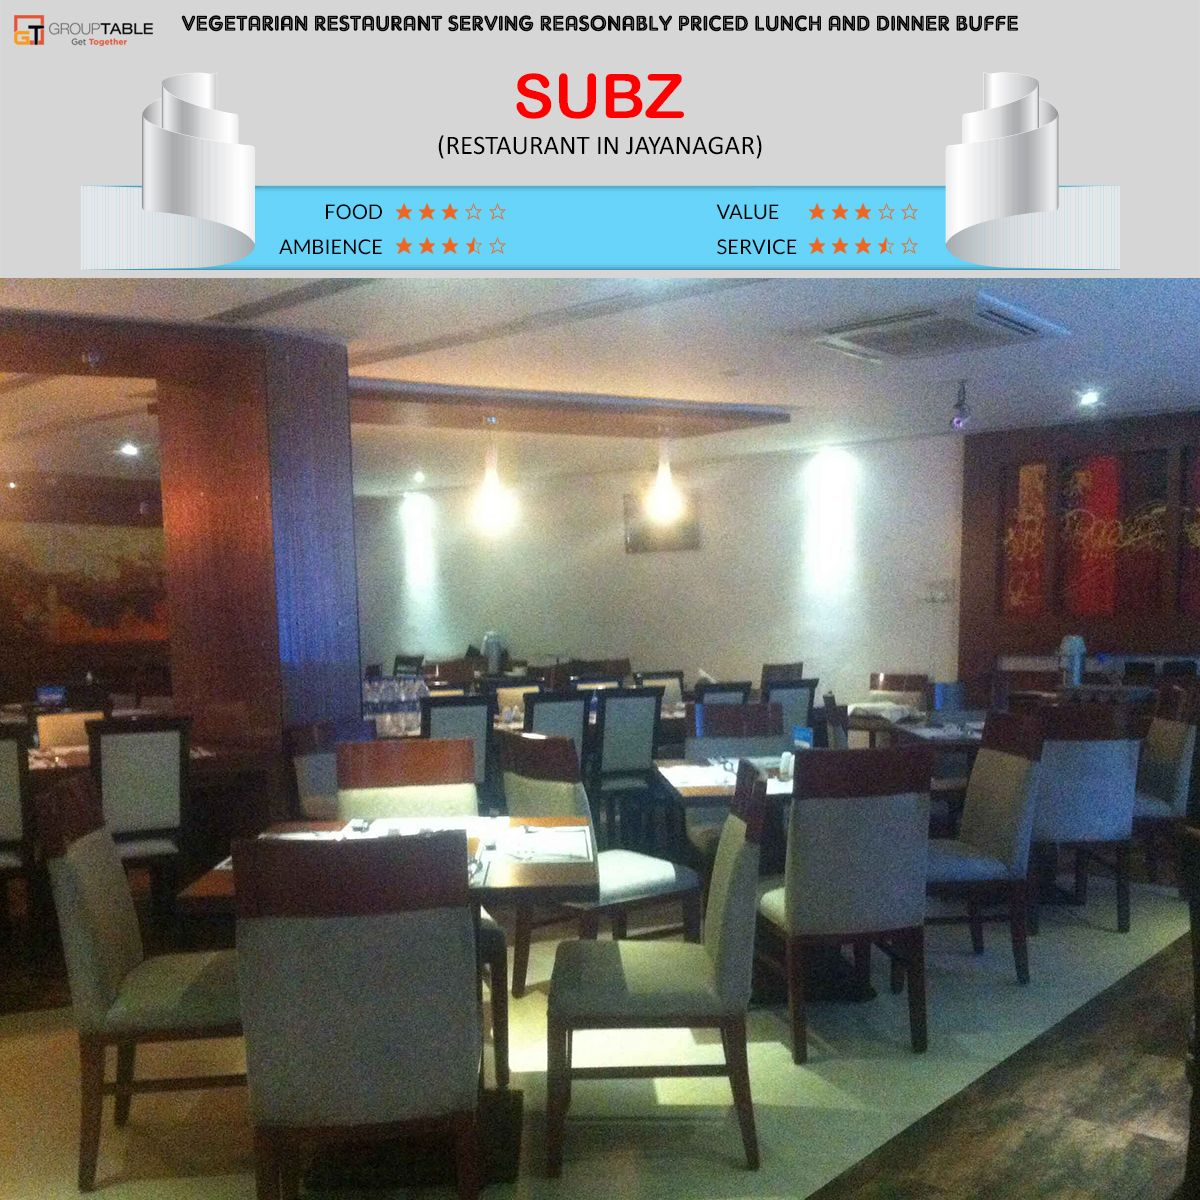 Subz Restaurant Bangalore Veg Restaurant Serving Reasonably Priced Lunch And Dinner Buffet Book A Vegetarian Restaurant Veg Restaurant Restaurant